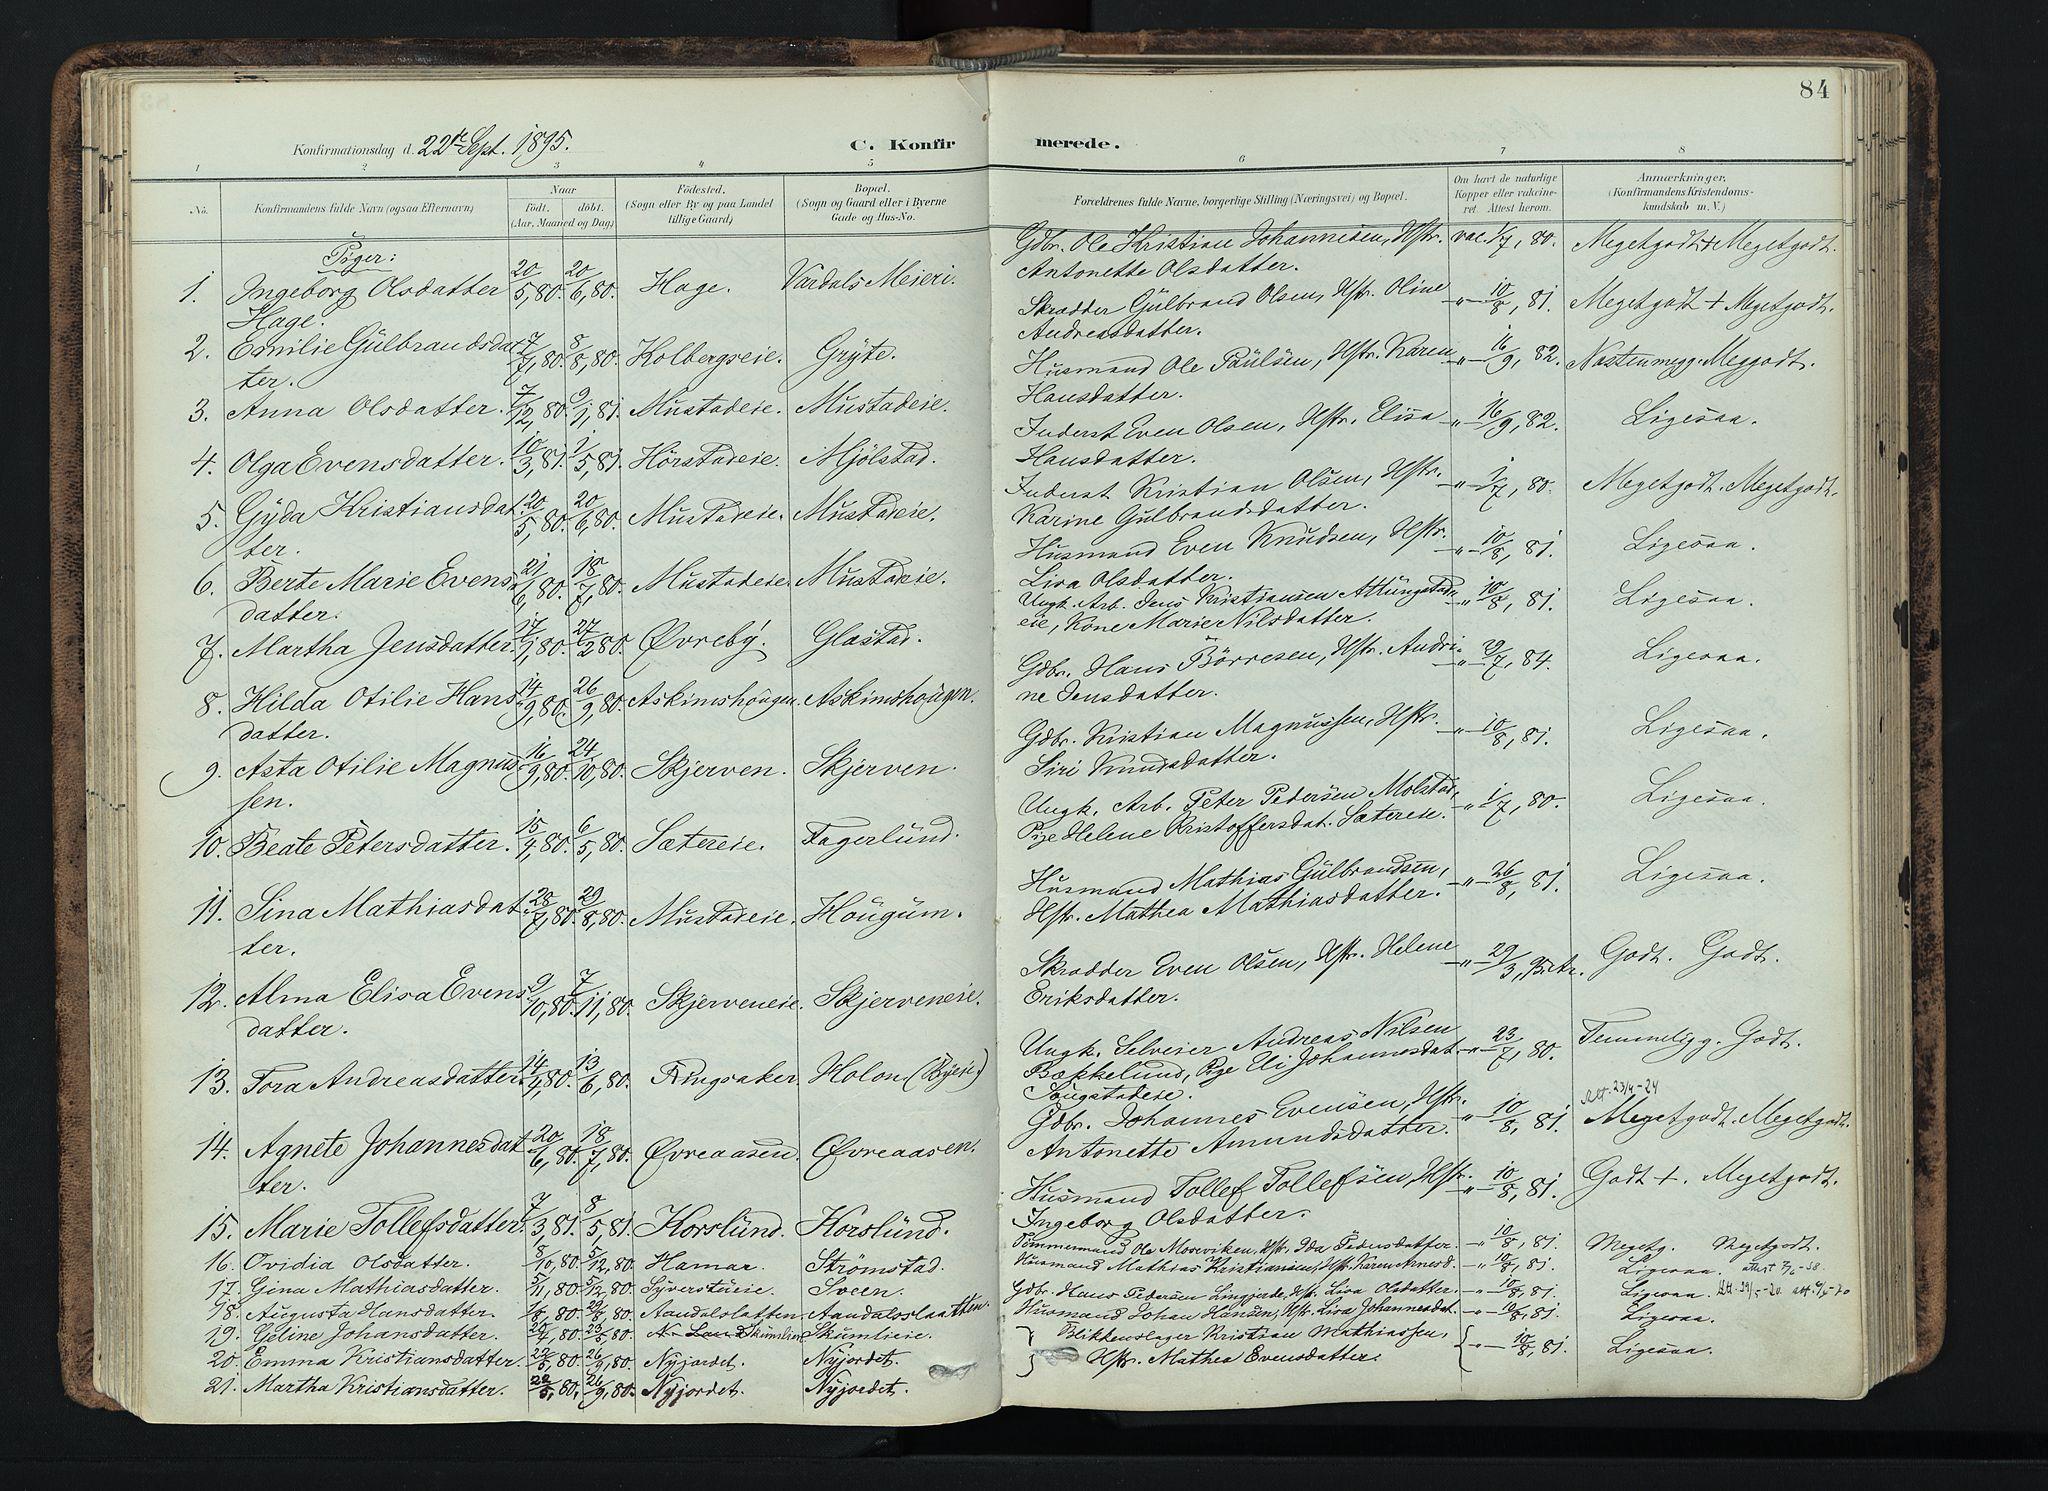 SAH, Vardal prestekontor, H/Ha/Haa/L0019: Ministerialbok nr. 19, 1893-1907, s. 84